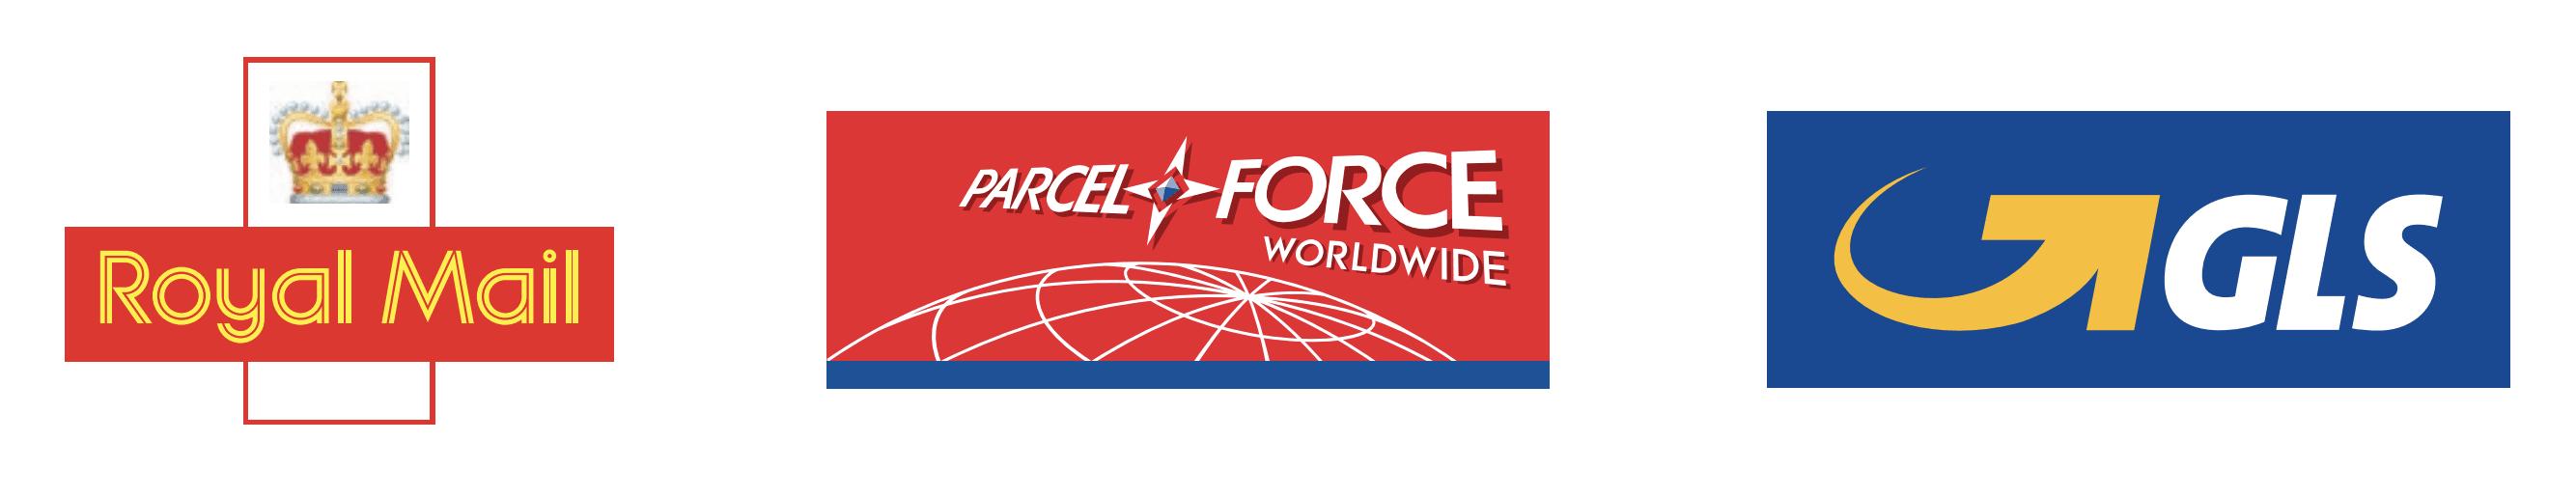 Pacrelforce Logos